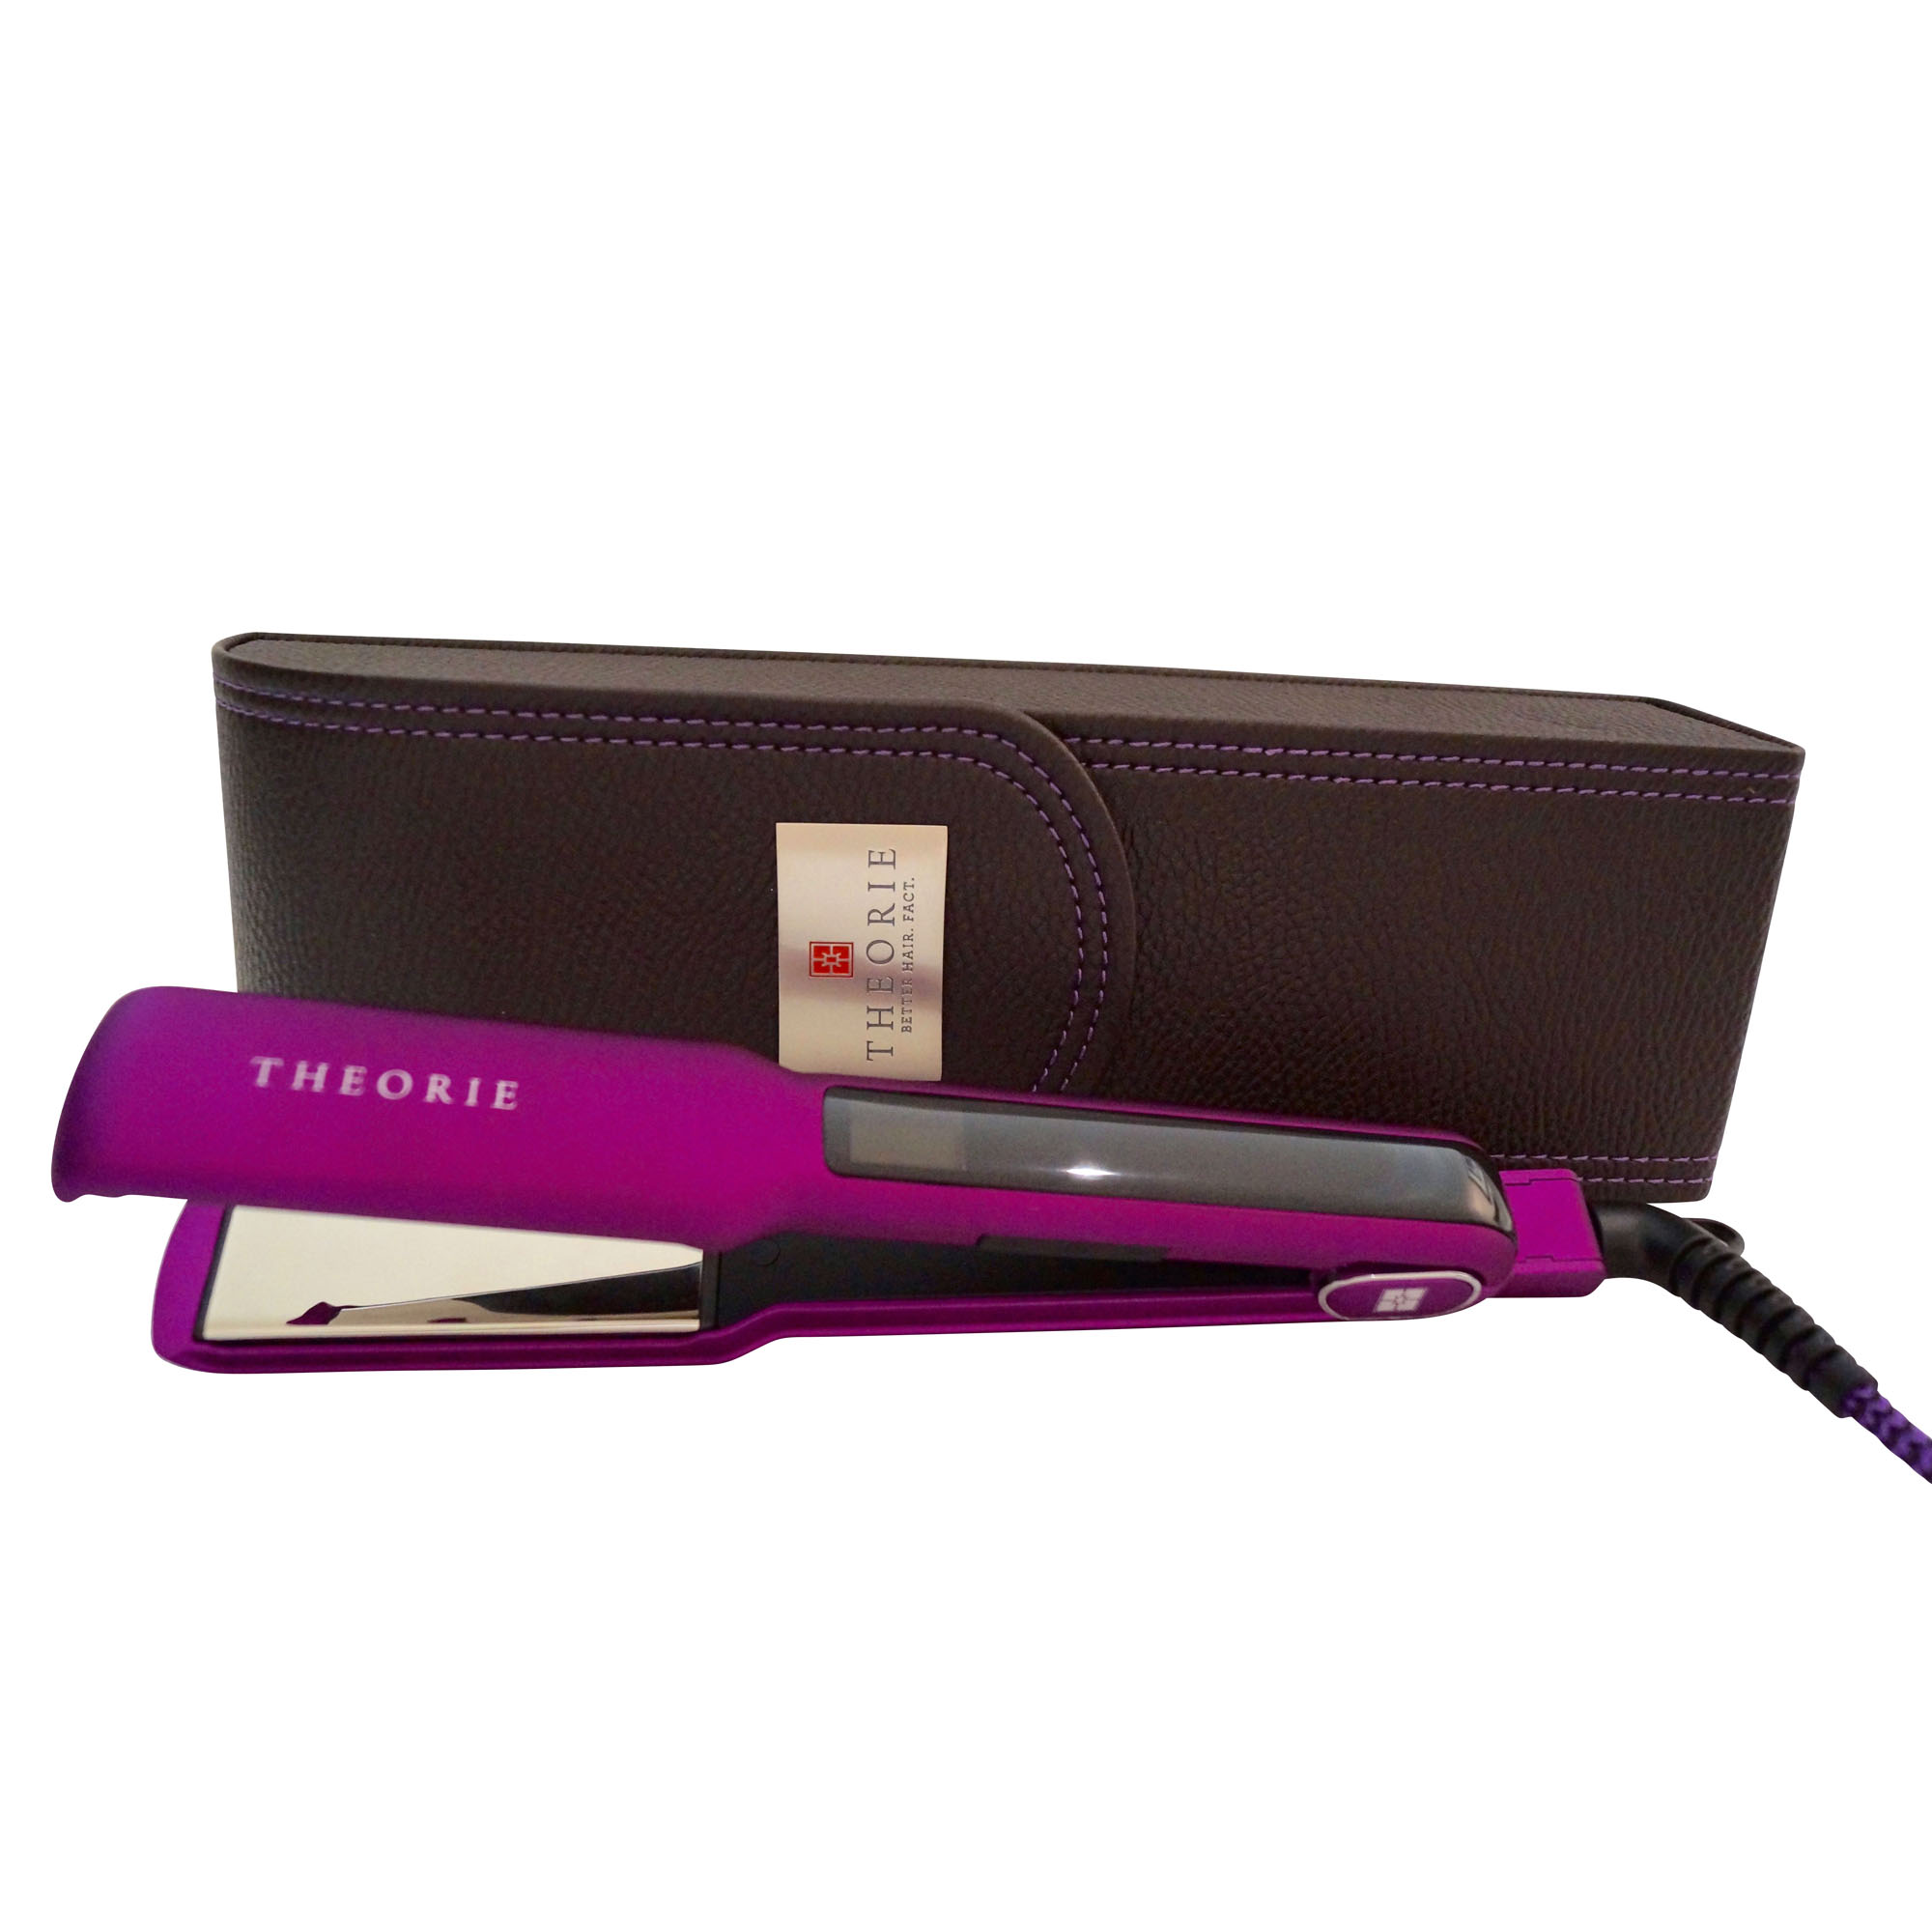 "Theorie Saga Classic Titanium Flat Iron Purple with Brown Leather Case, 1 1/2"""